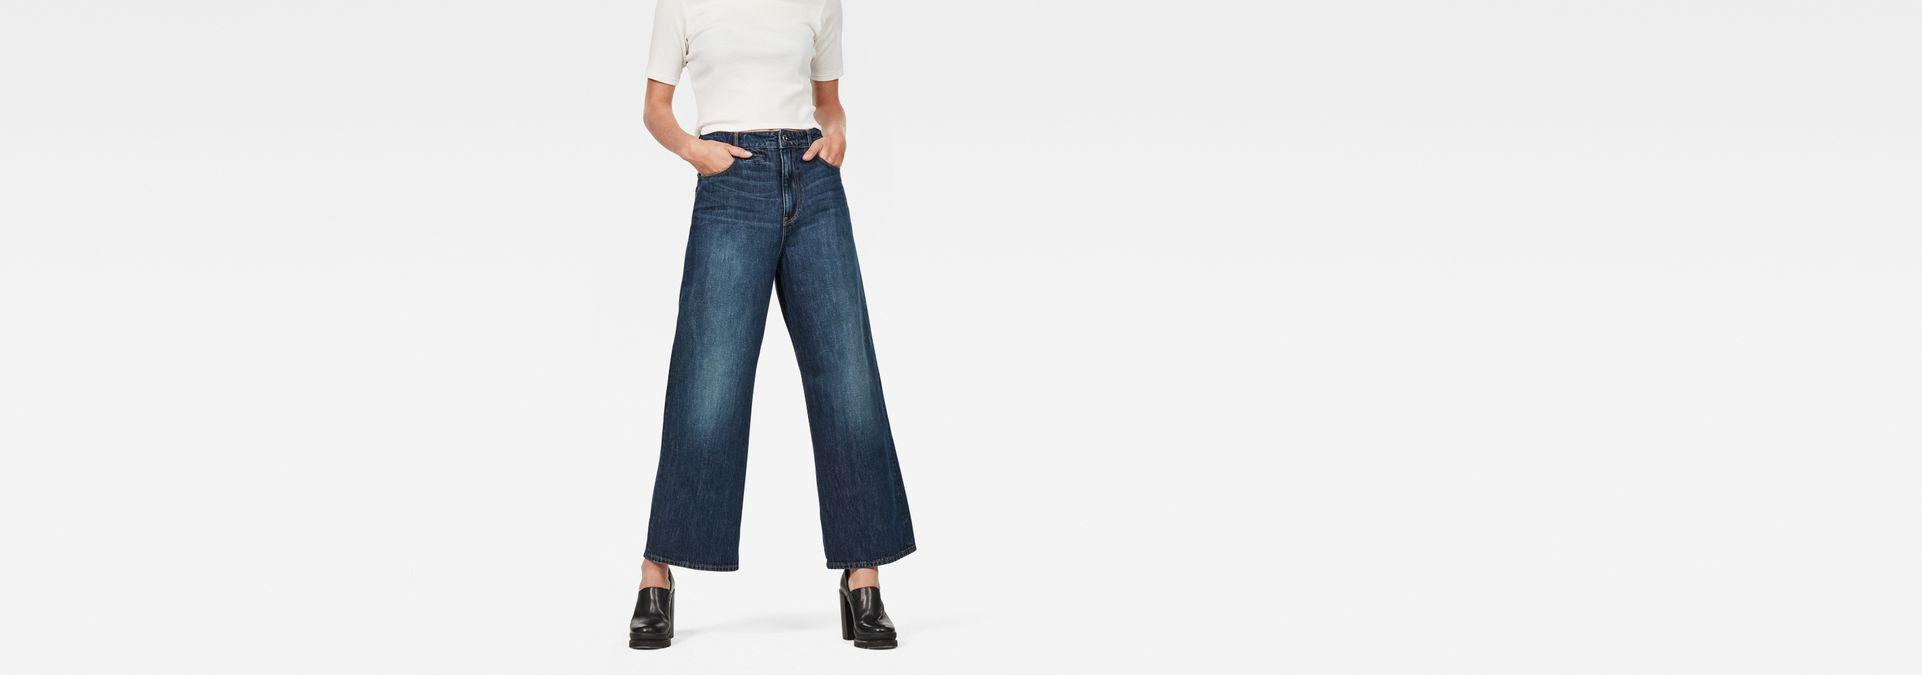 22c1c6c66e G-Star RAW® D-Staq 5-Pocket High Waist Wide Leg Jeans ...